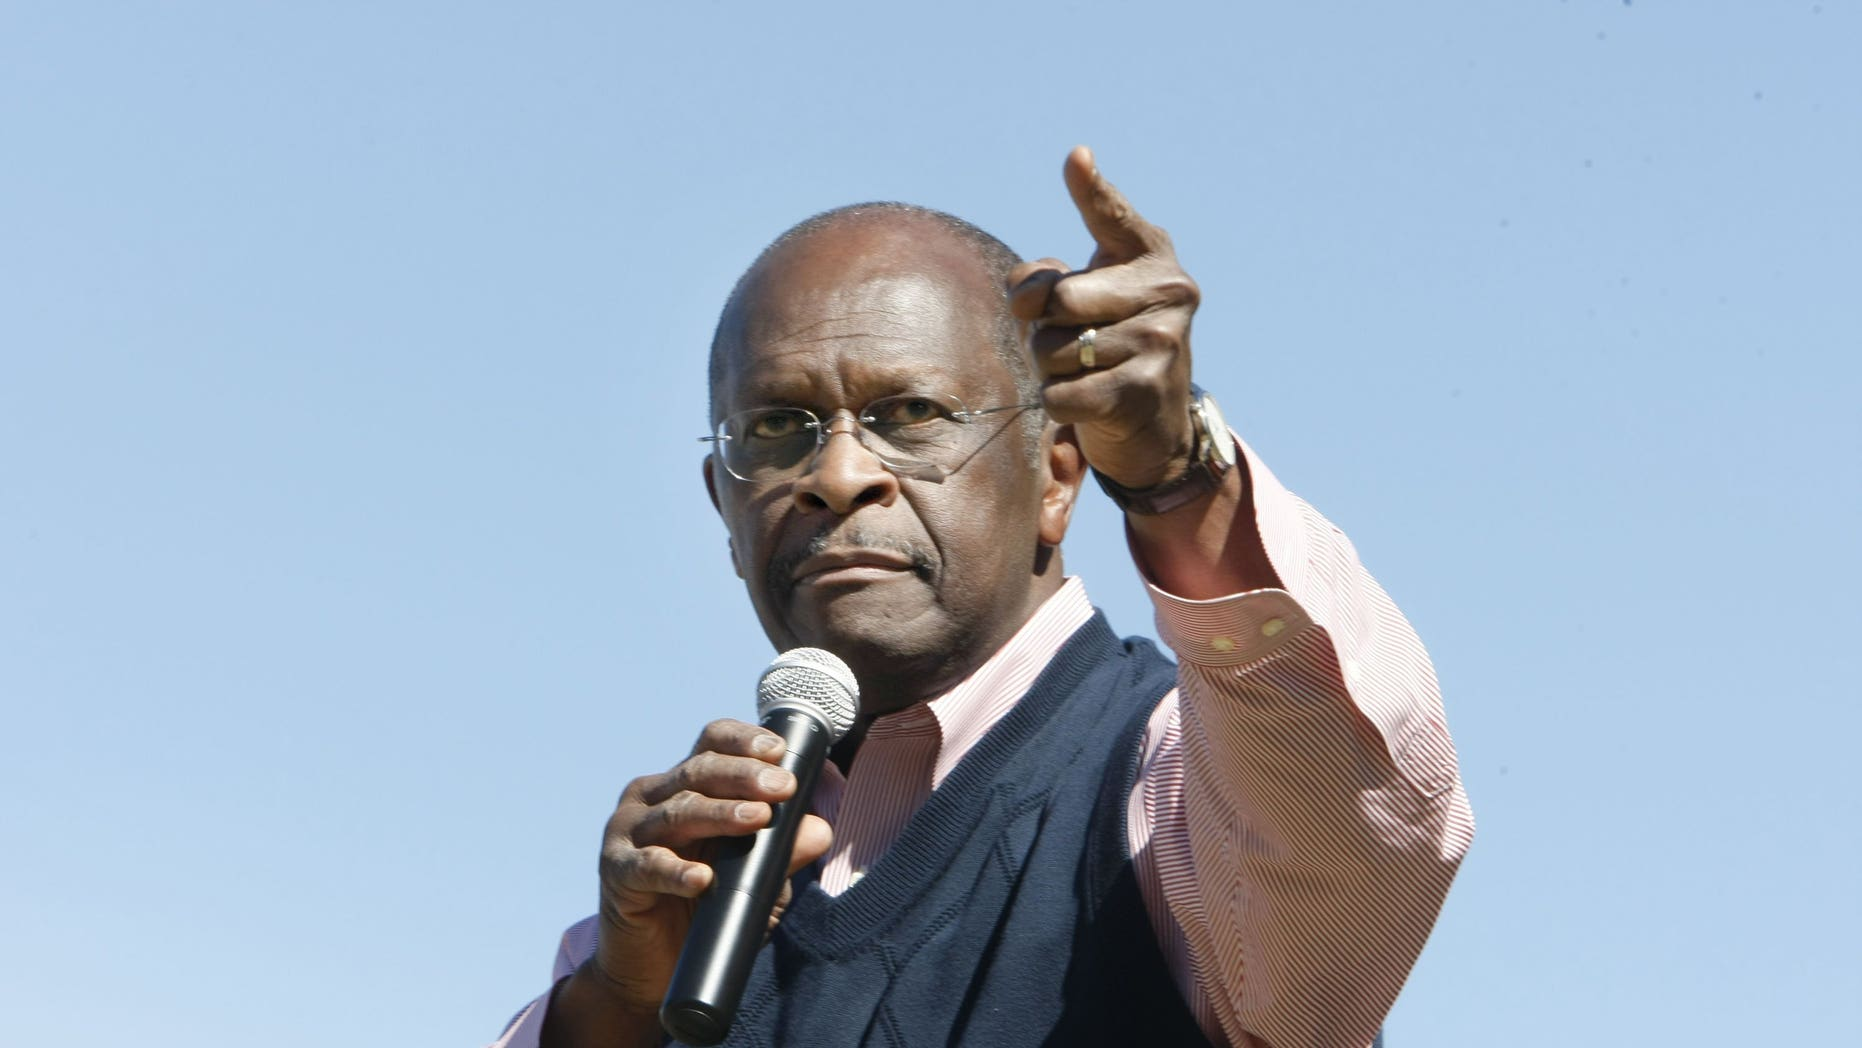 Oct. 14, 2011: Herman Cain addresses a crowd in Bartlett, Tenn.